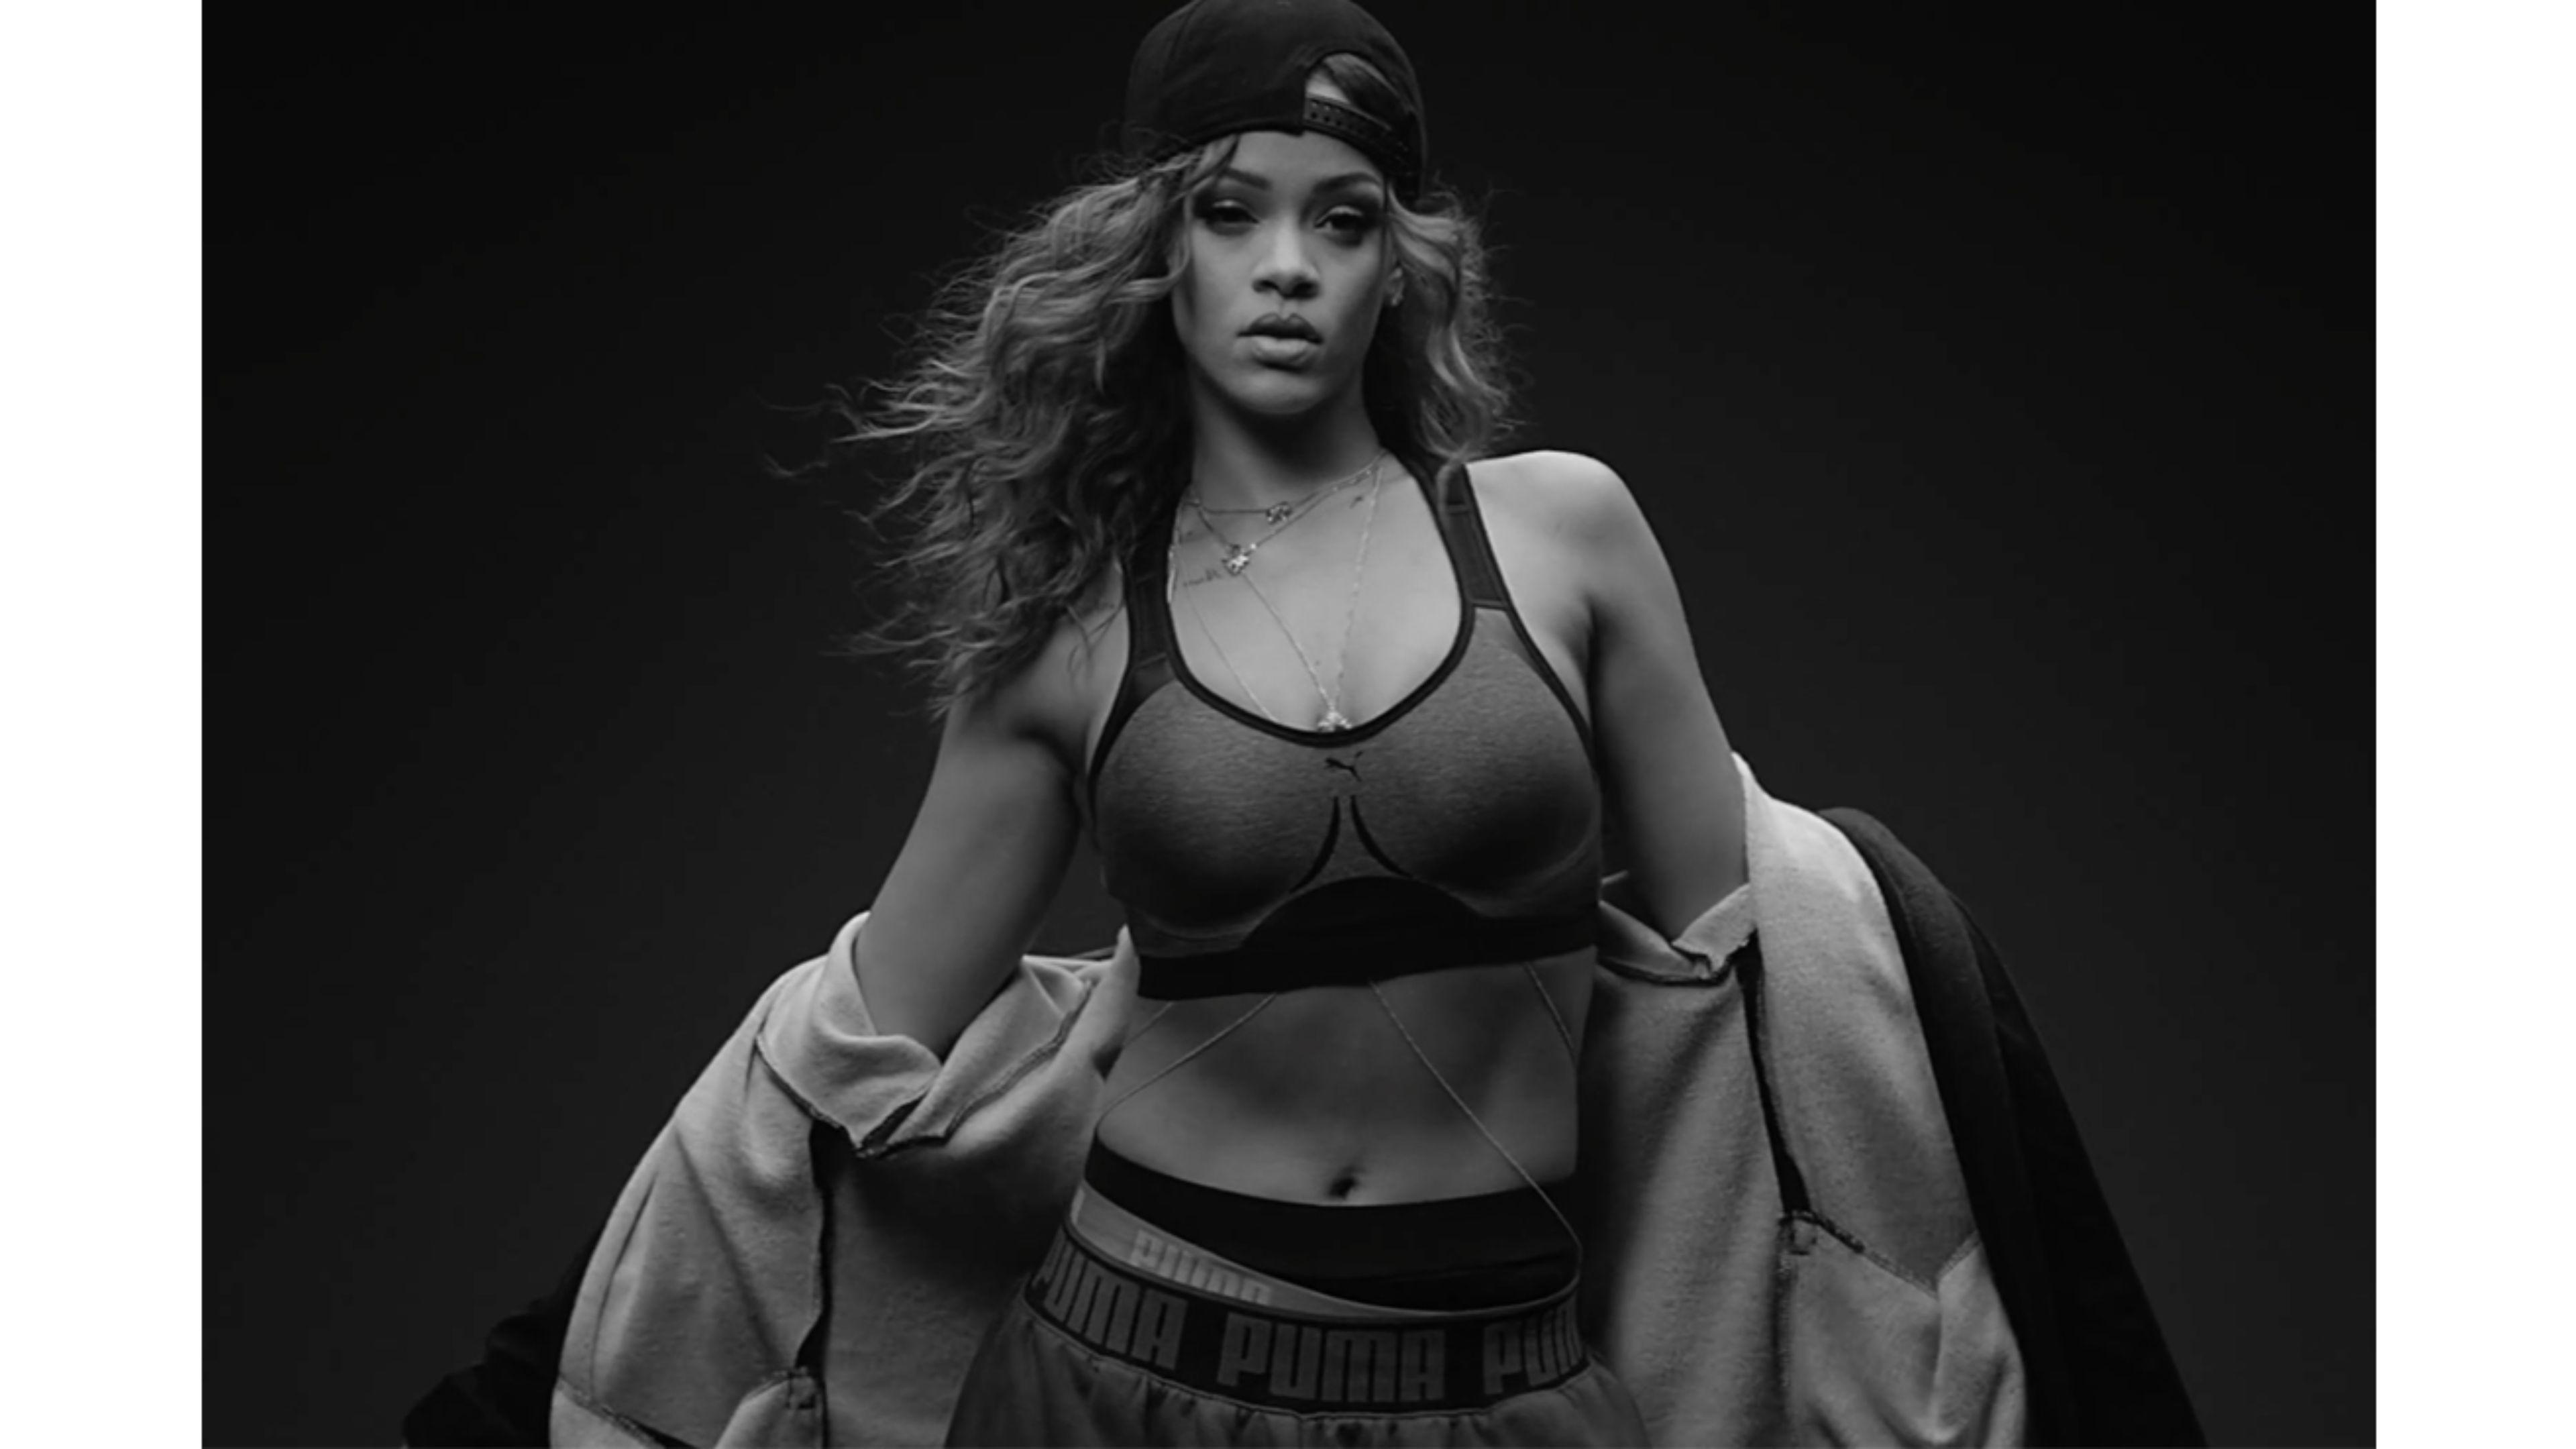 Rihanna Wallpaper 65 images